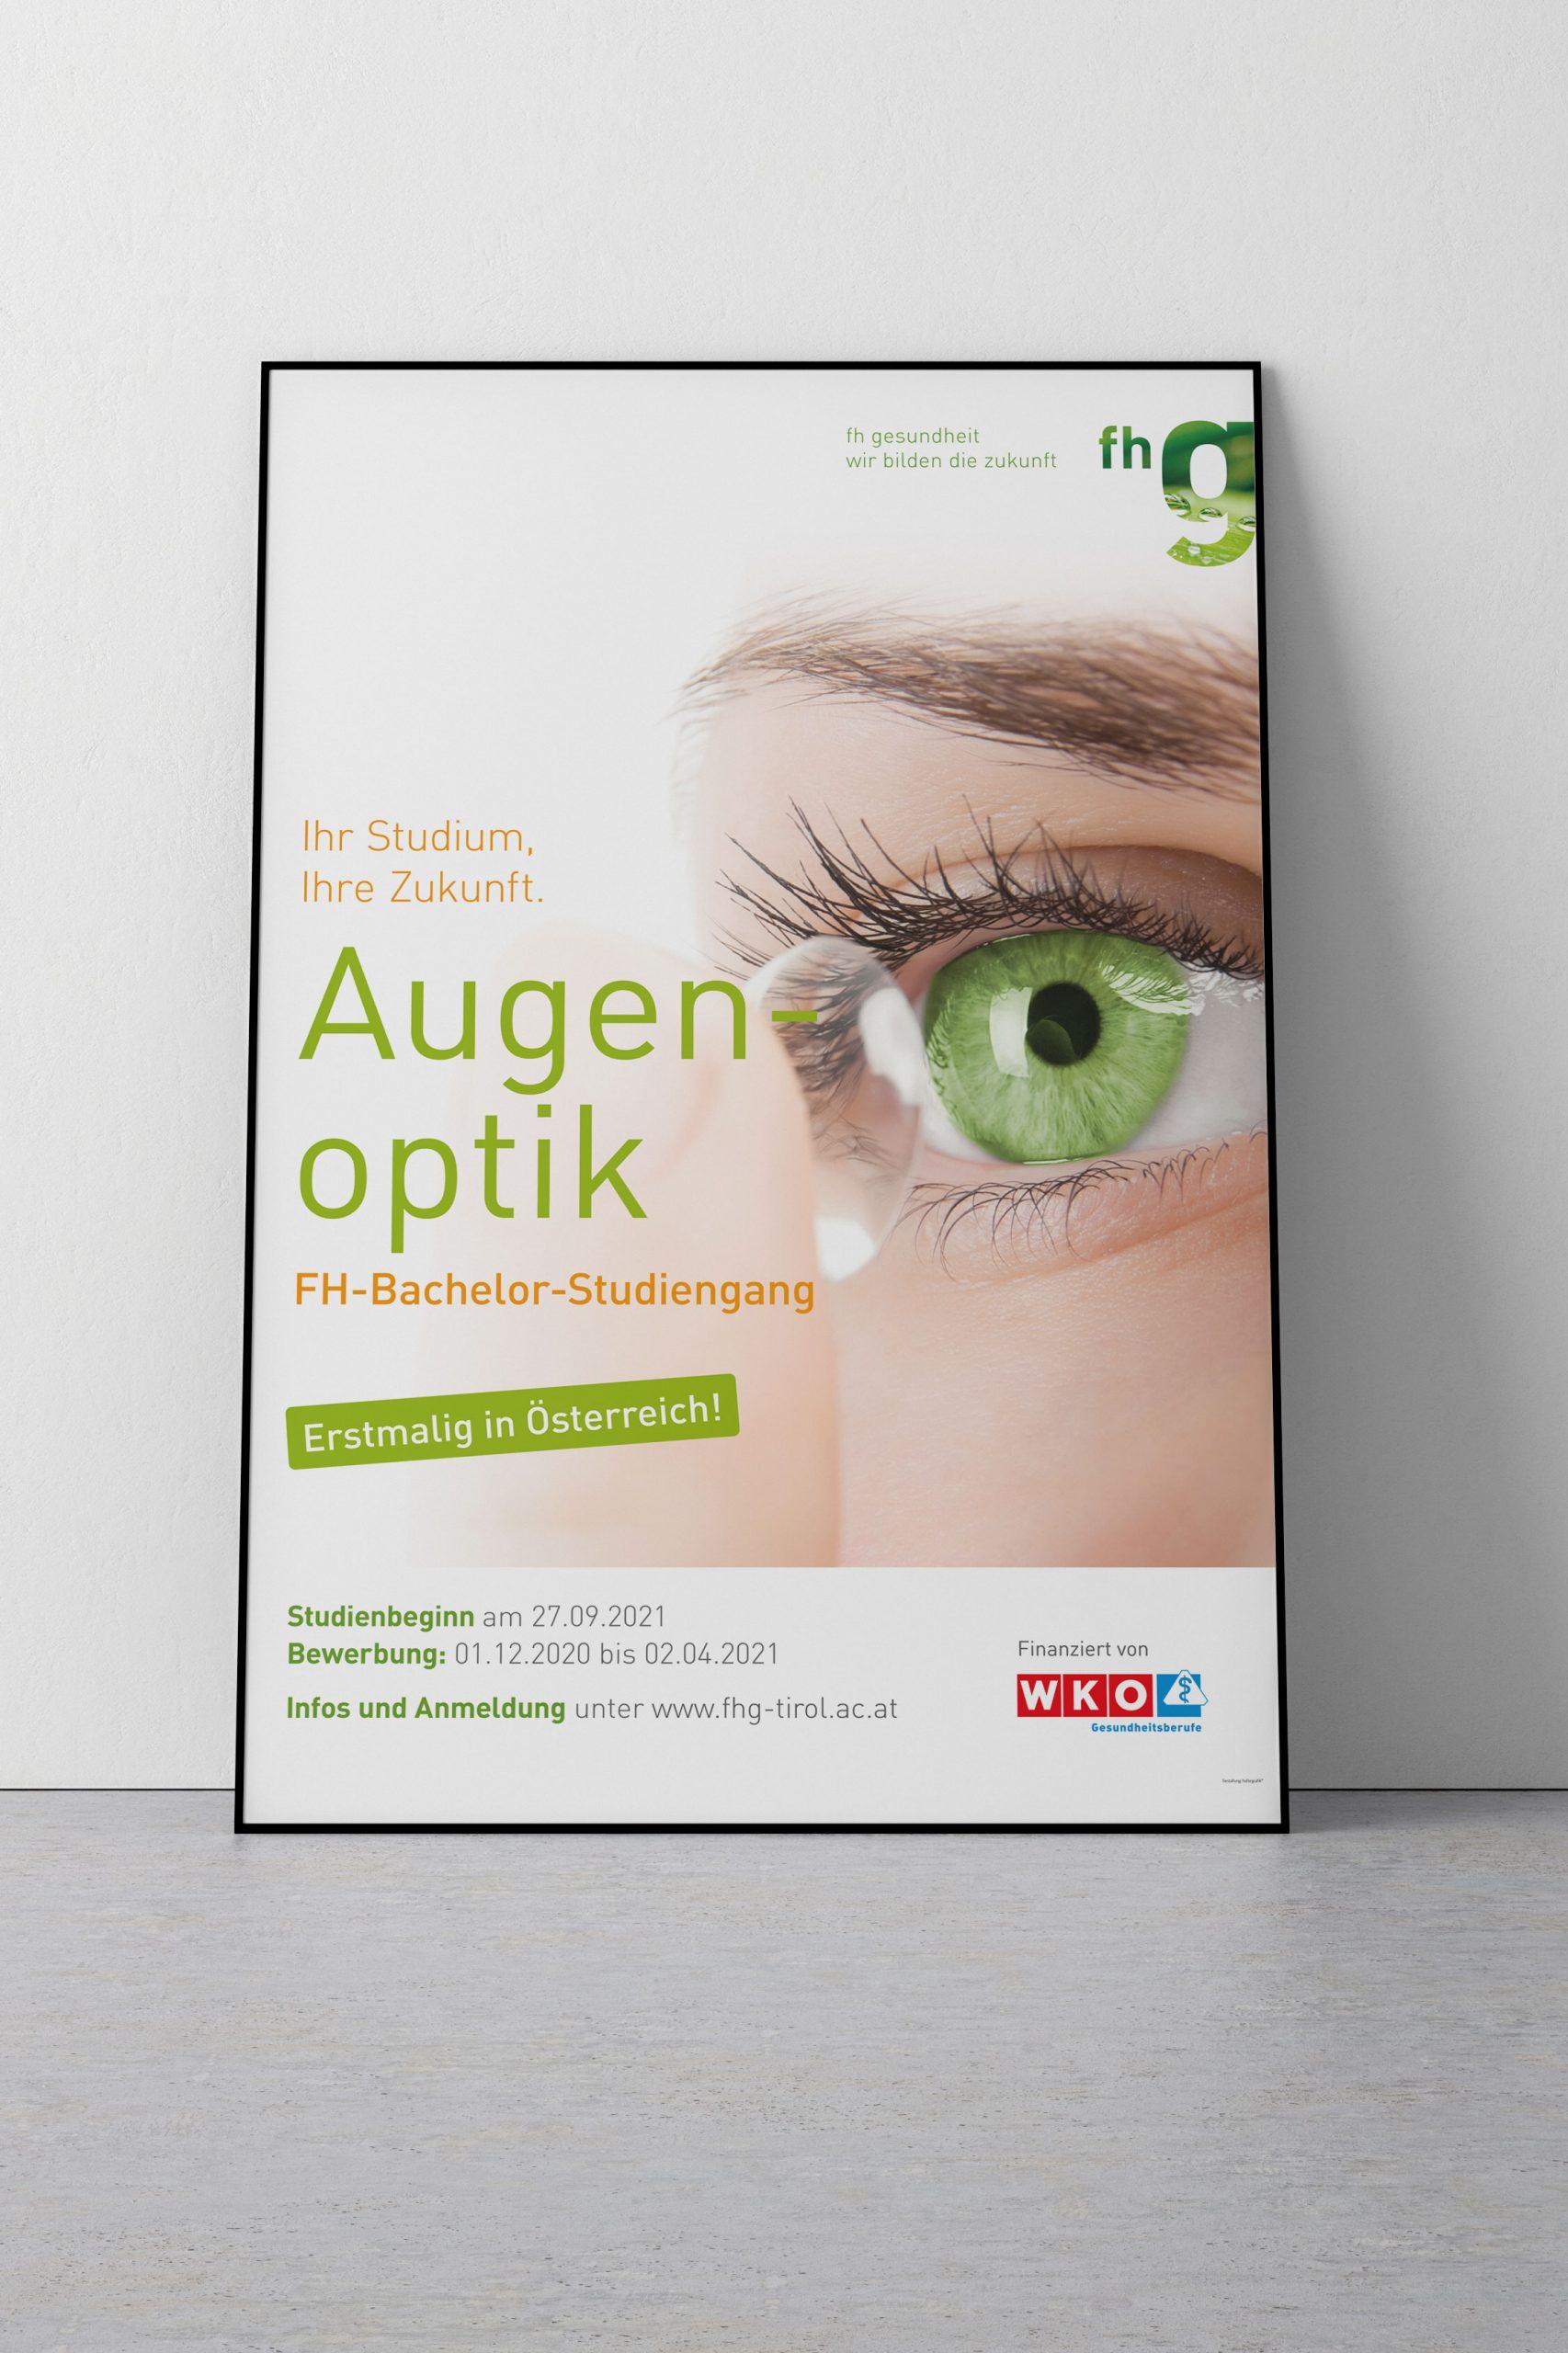 Plakat fhg Augenoptik Studiengang